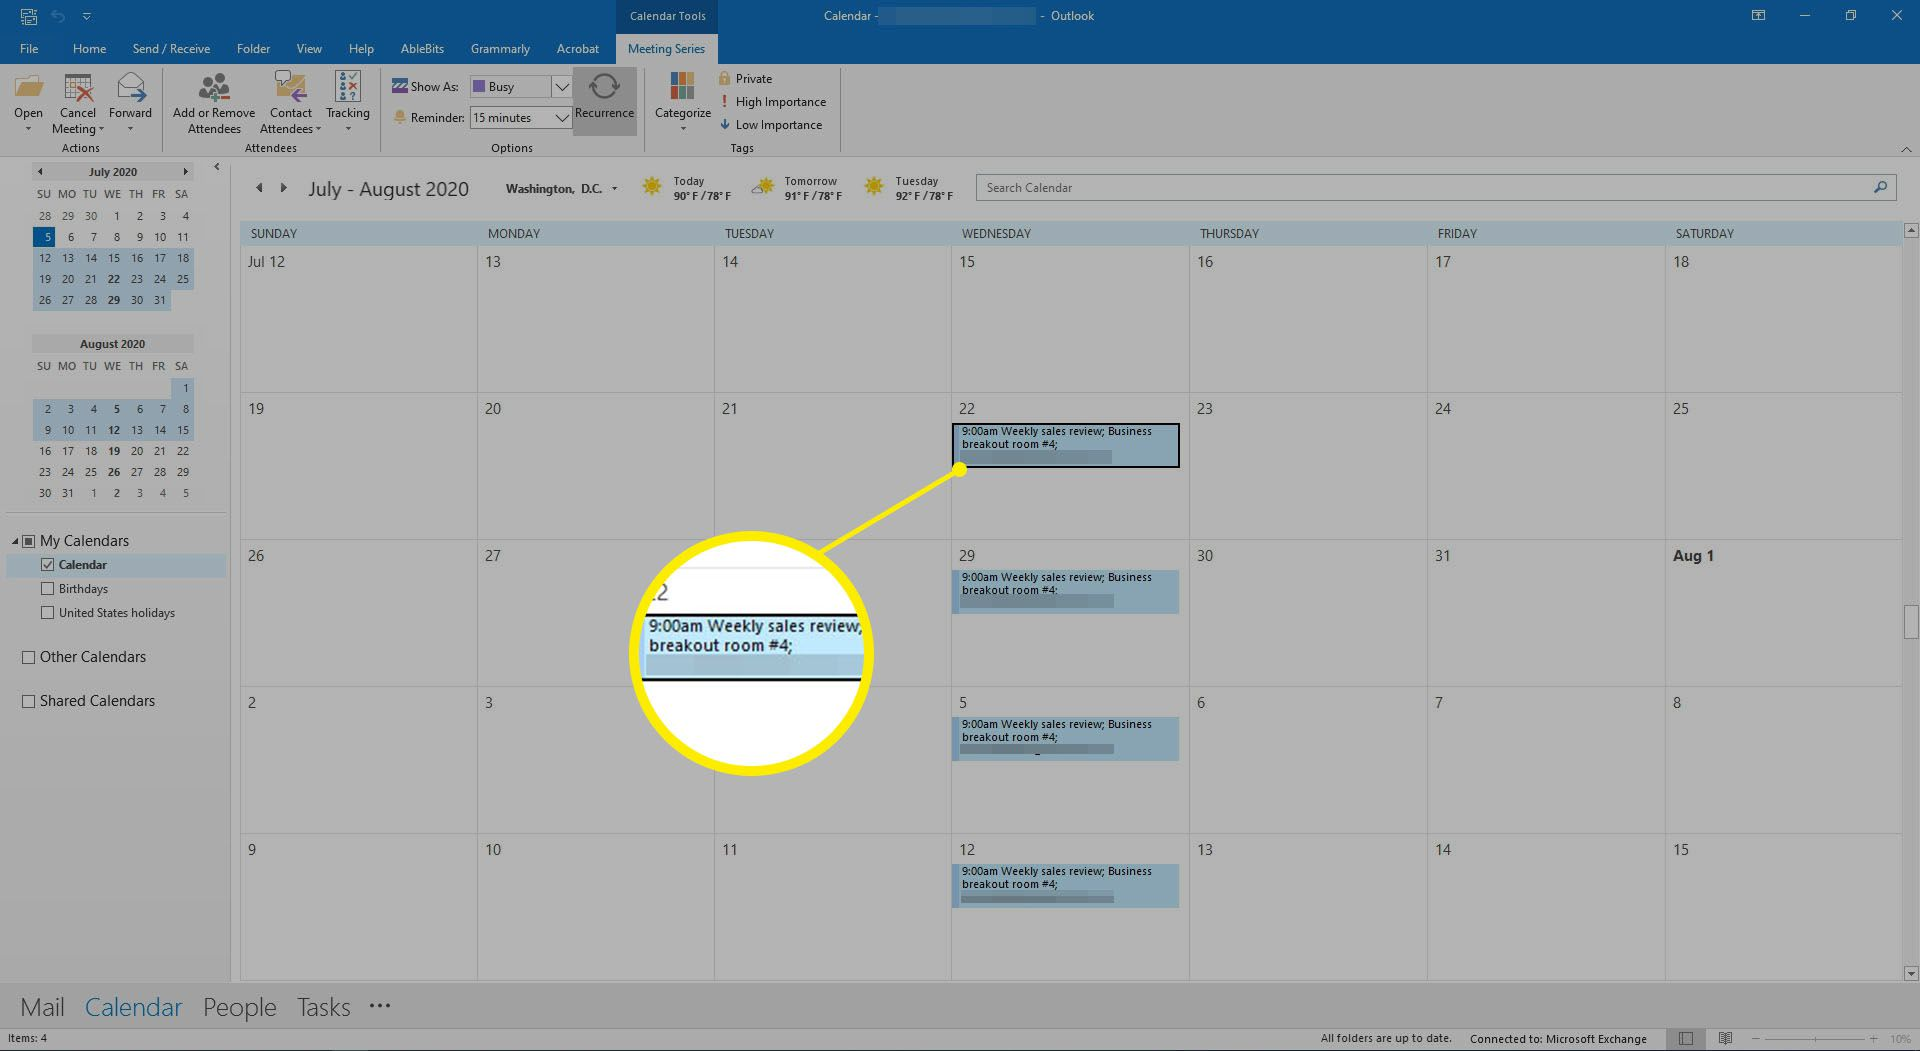 Selecting a meeting on an Outlook calendar.